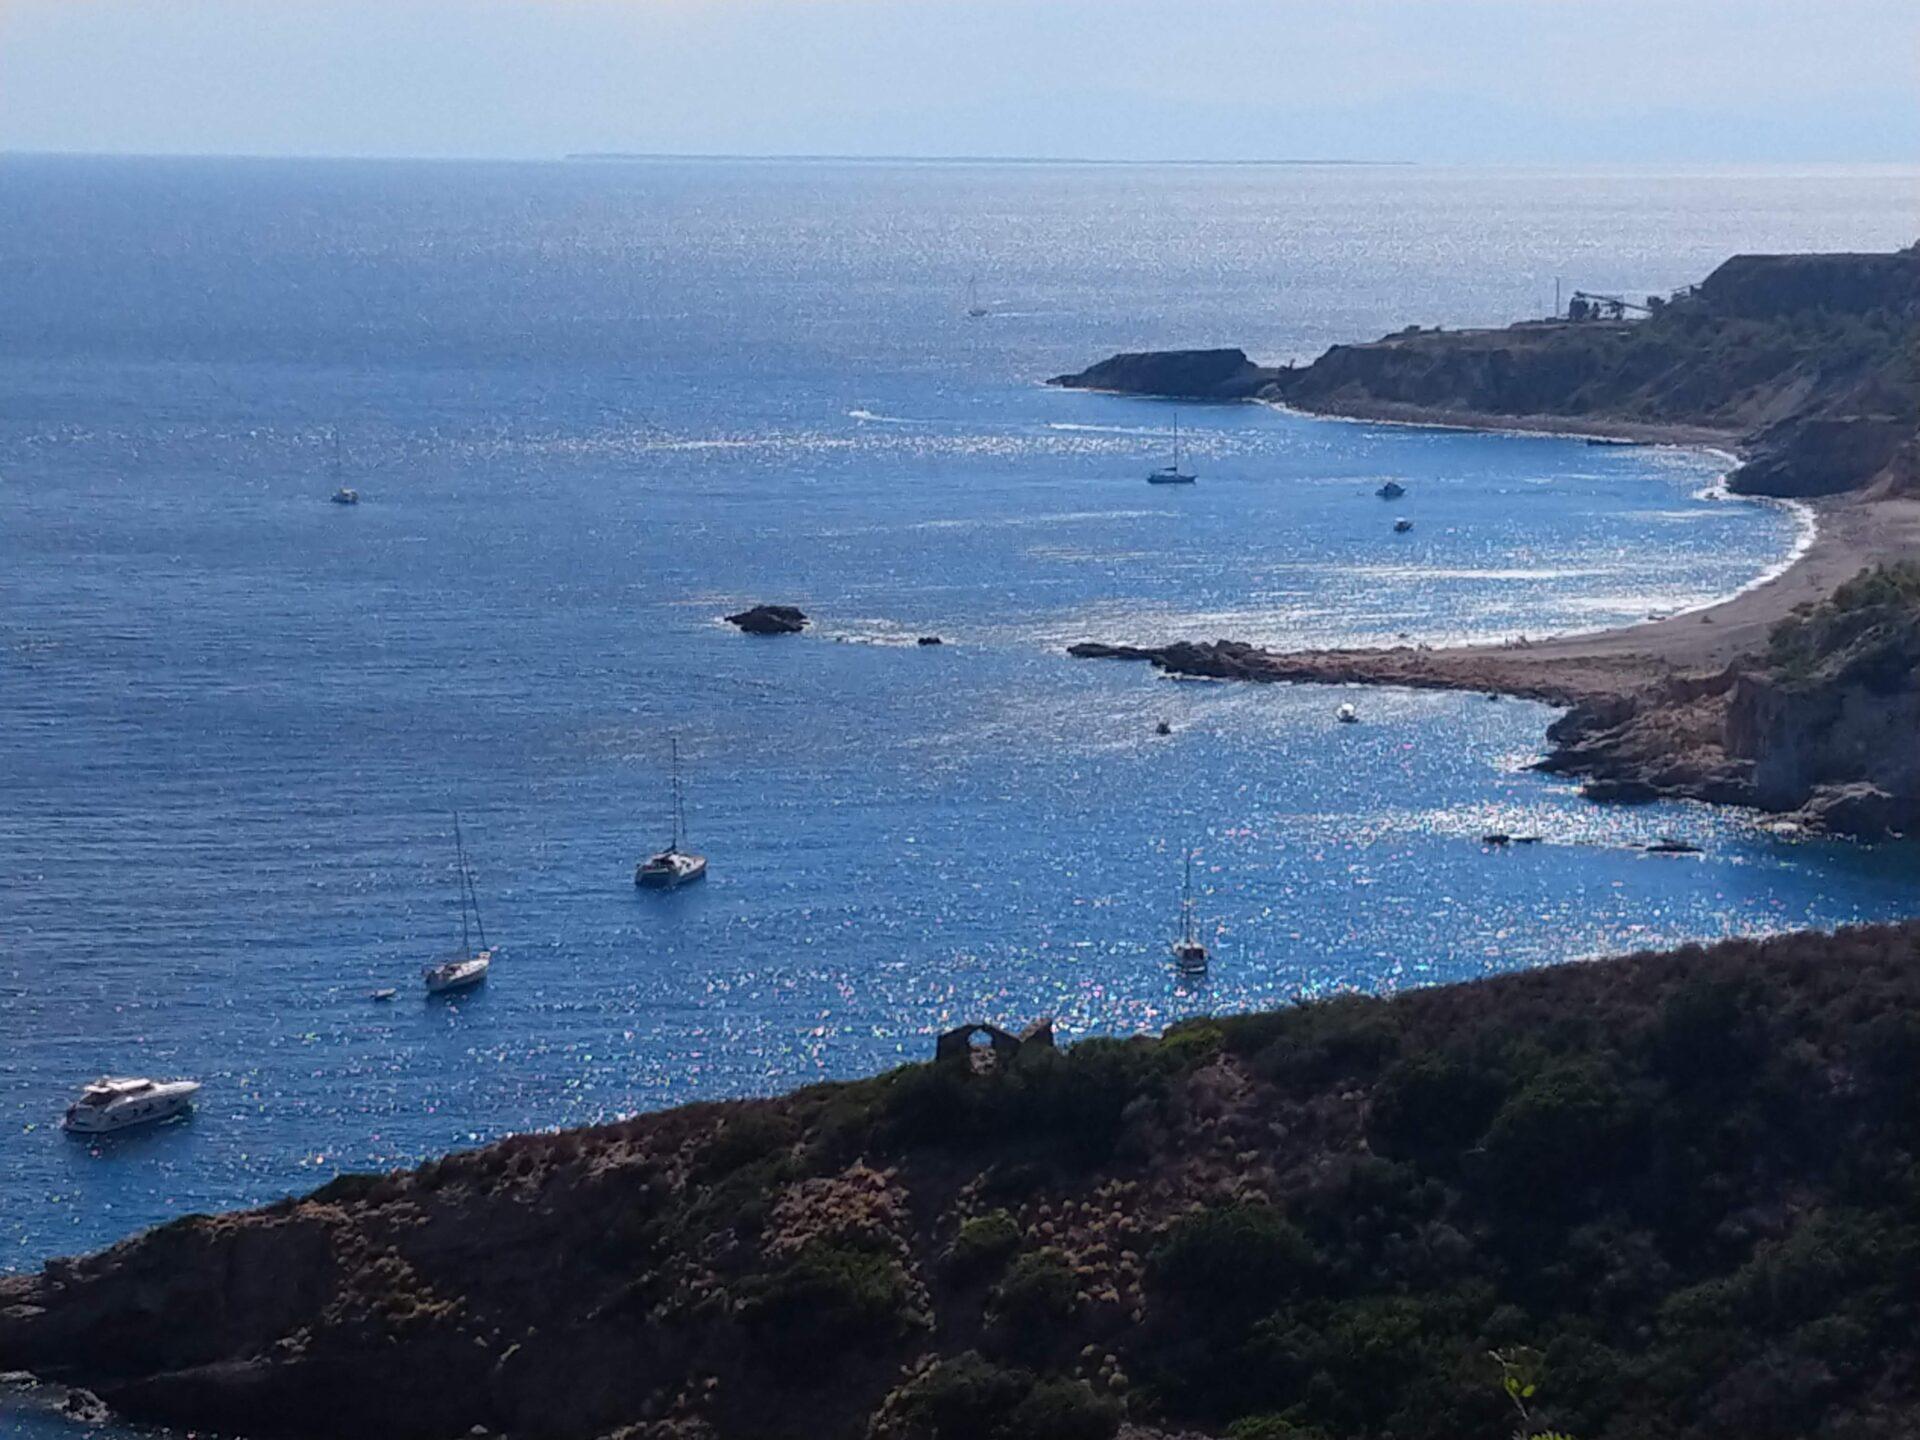 Cerboli Katabasis Snorkeling Tuscany